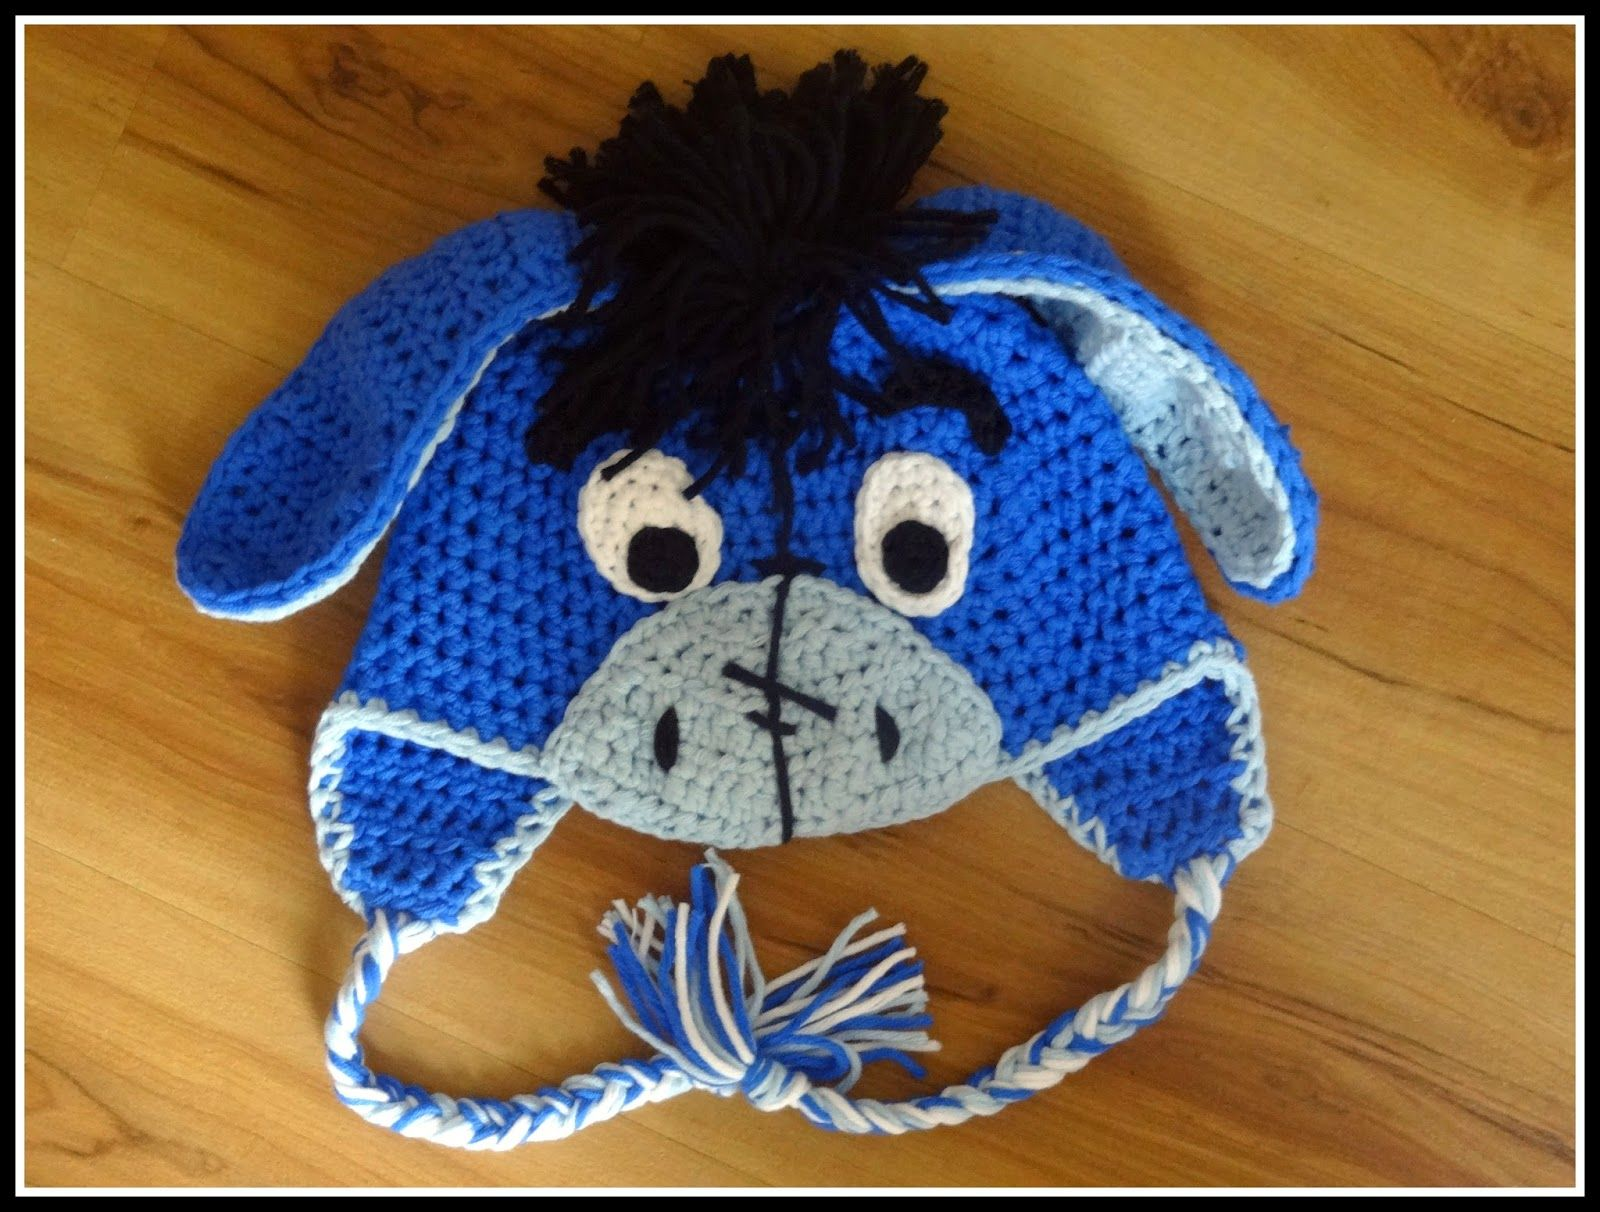 Fannysbuntewelt: Eselsmütze Größe 52 | Crochet Eeyore | Pinterest ...